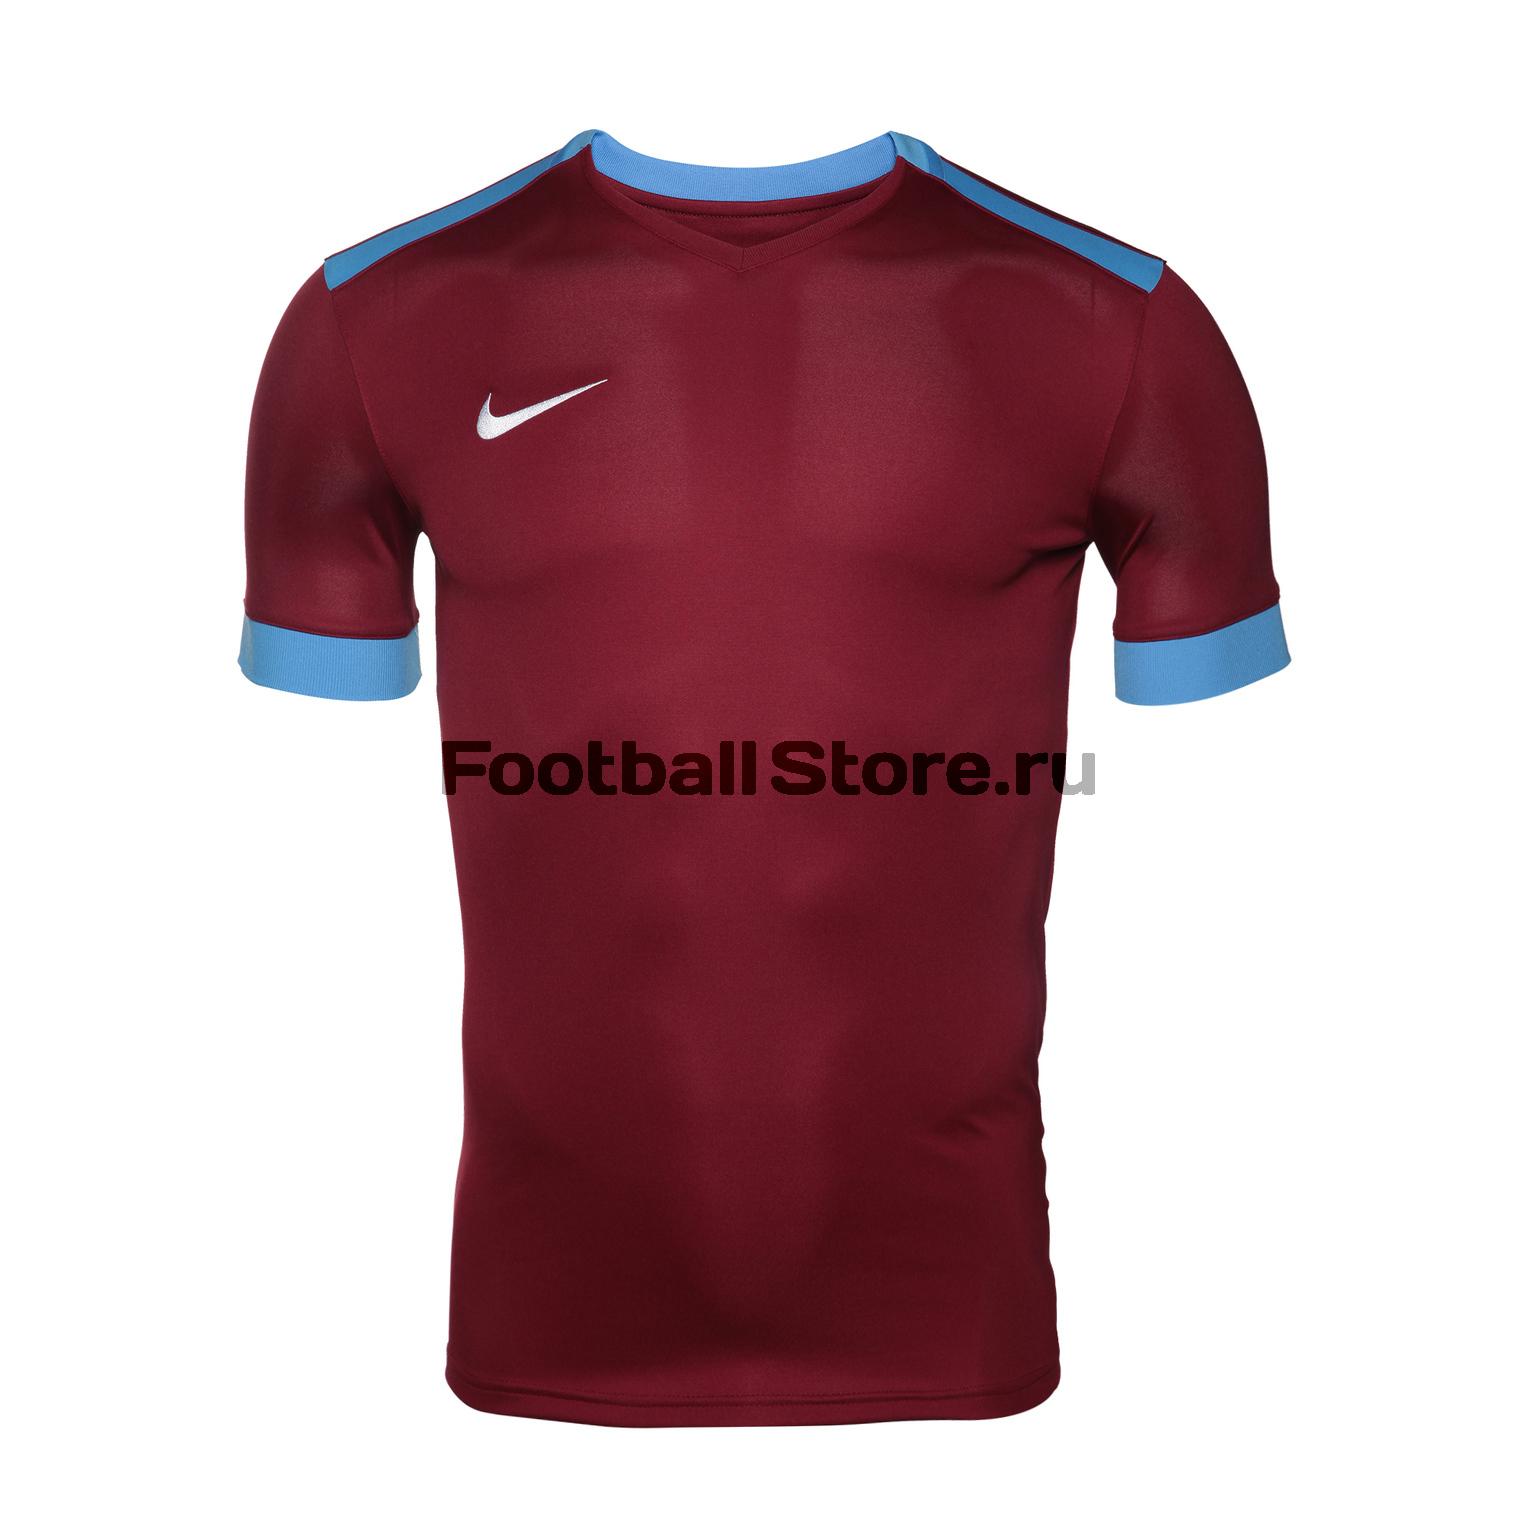 Футболка игровая Nike Park Derby II JSY SS 894312-677 футболка игровая nike ls park derby jsy 588414 106